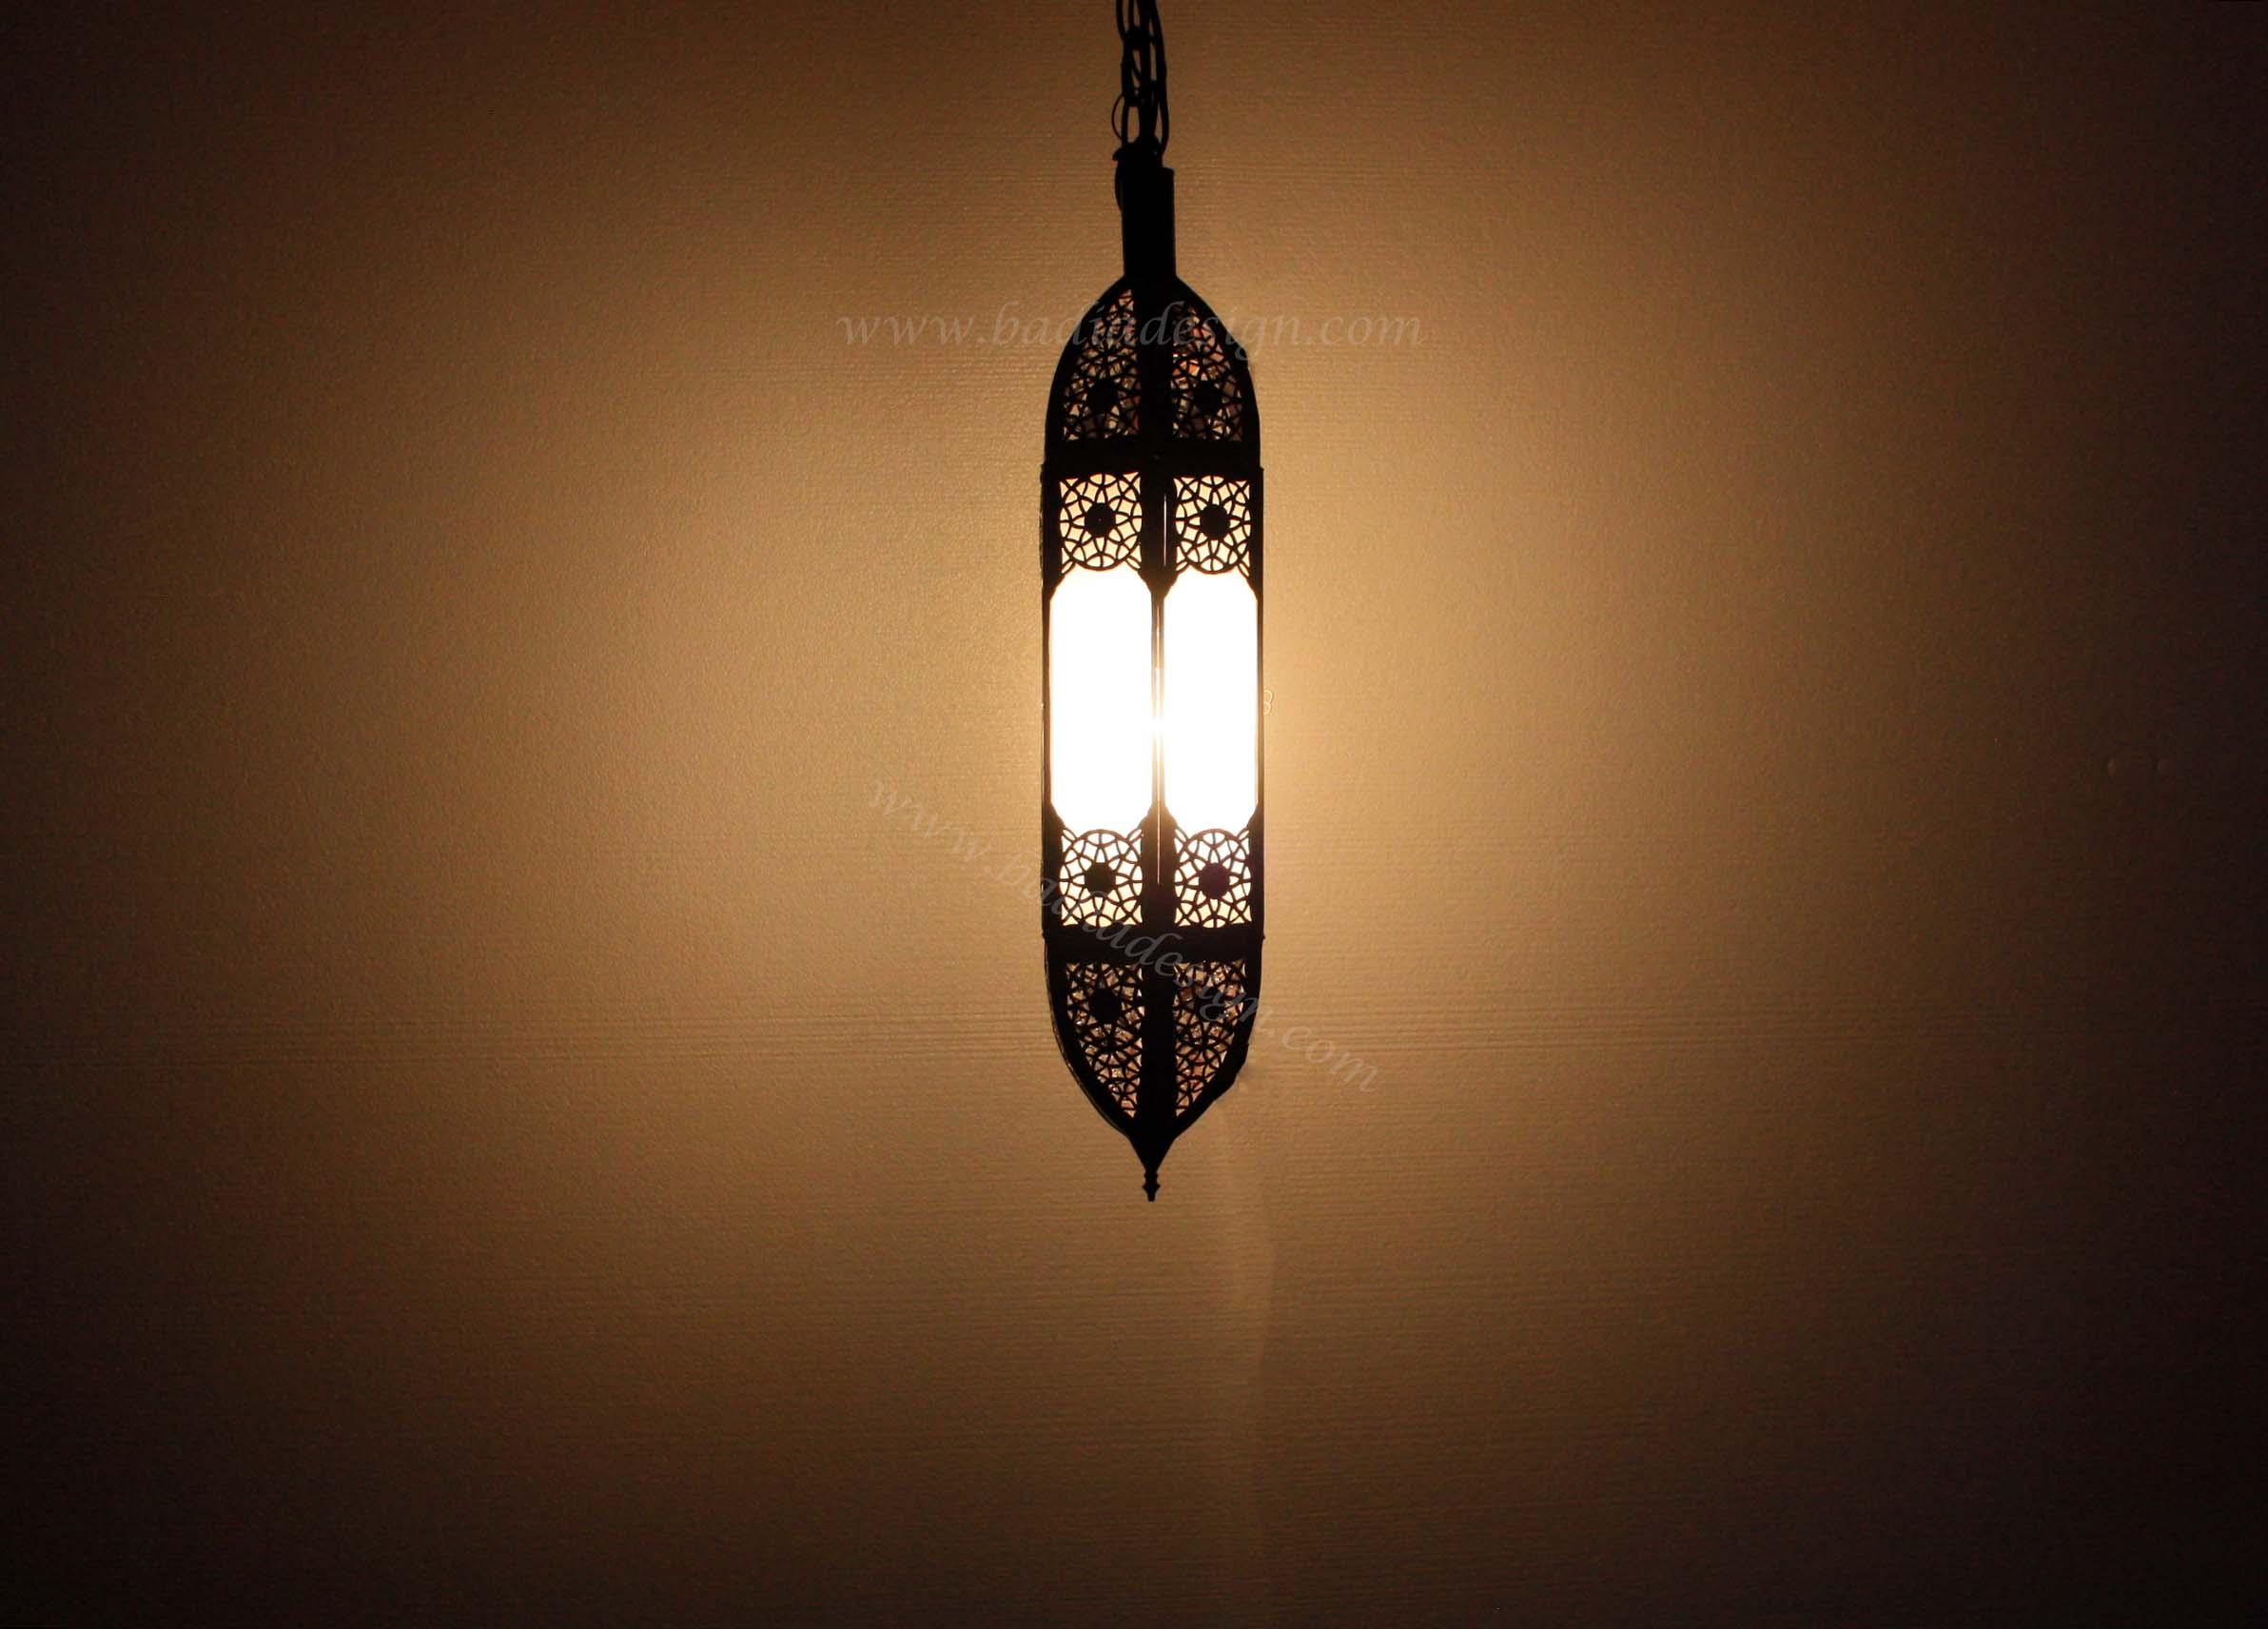 moroccan hanging white glass lantern from badia design inc